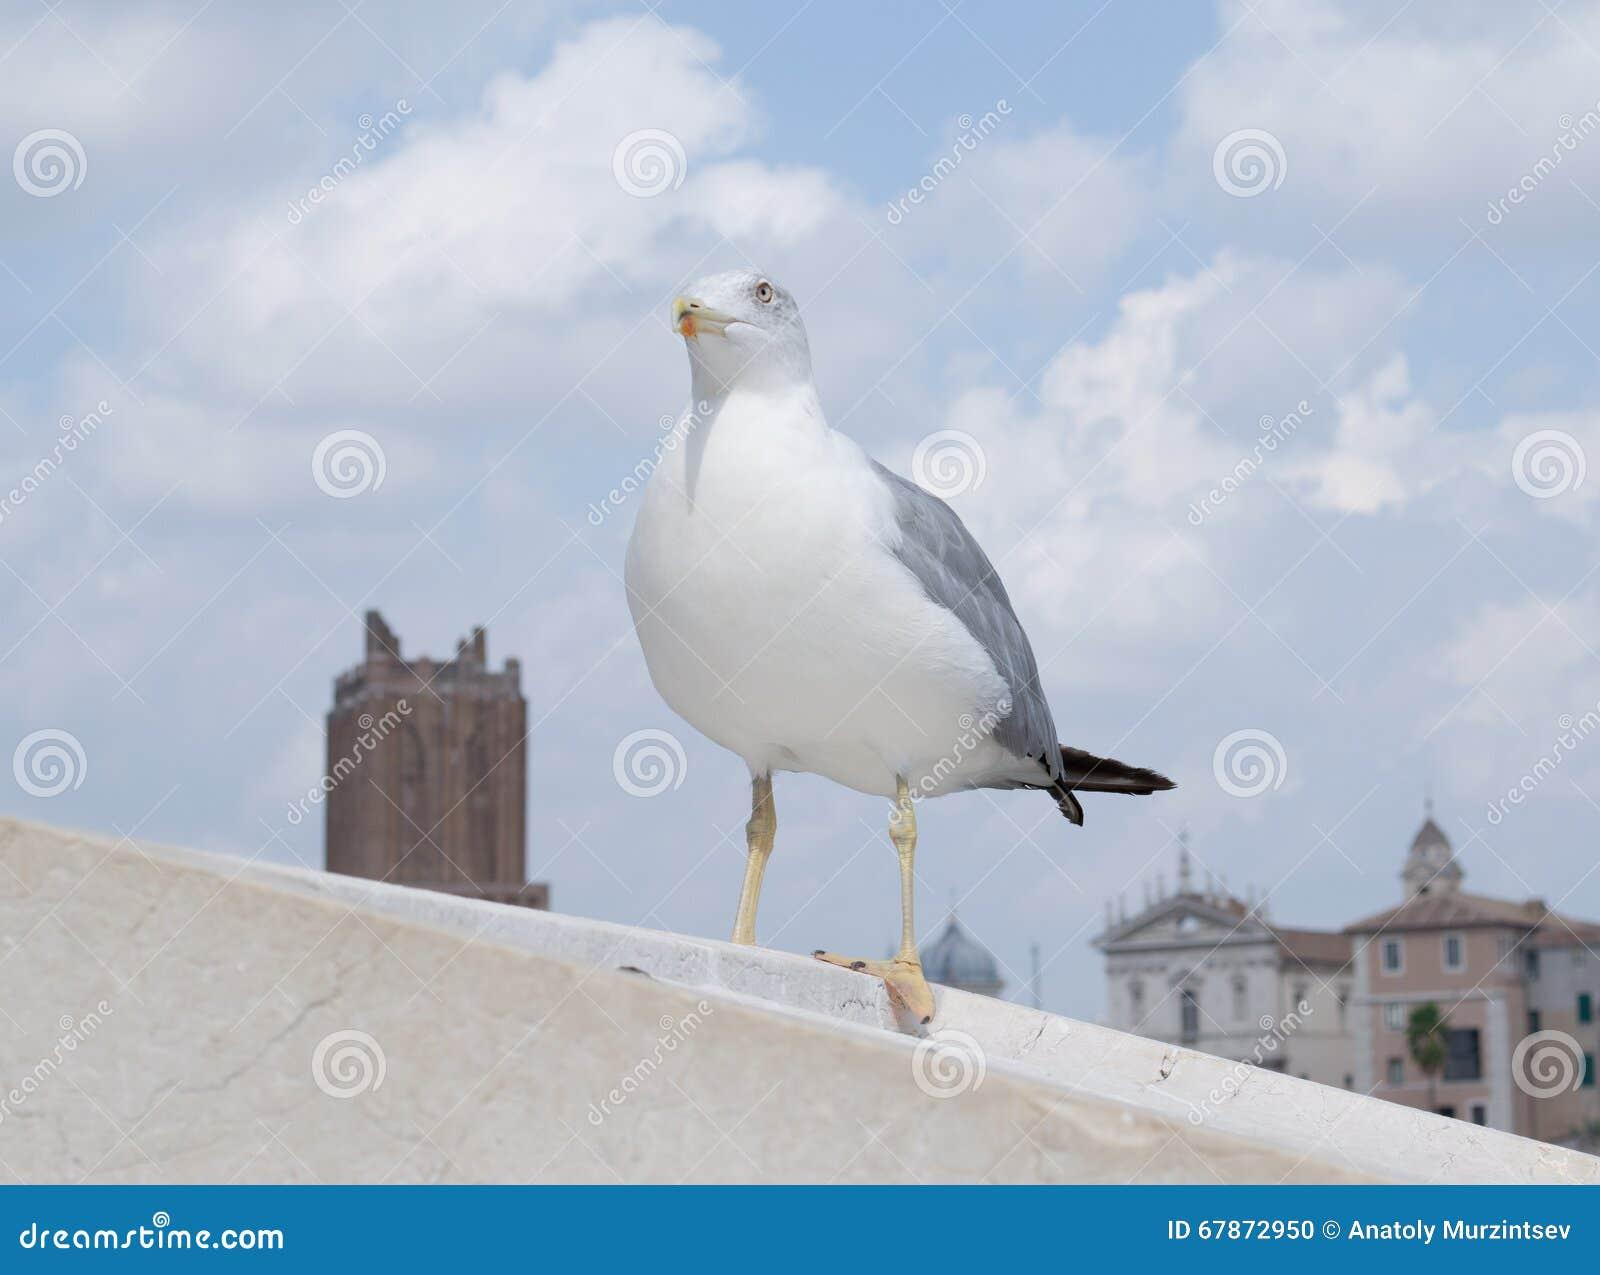 Inspirational image of european herring gull (Larus argentatus)